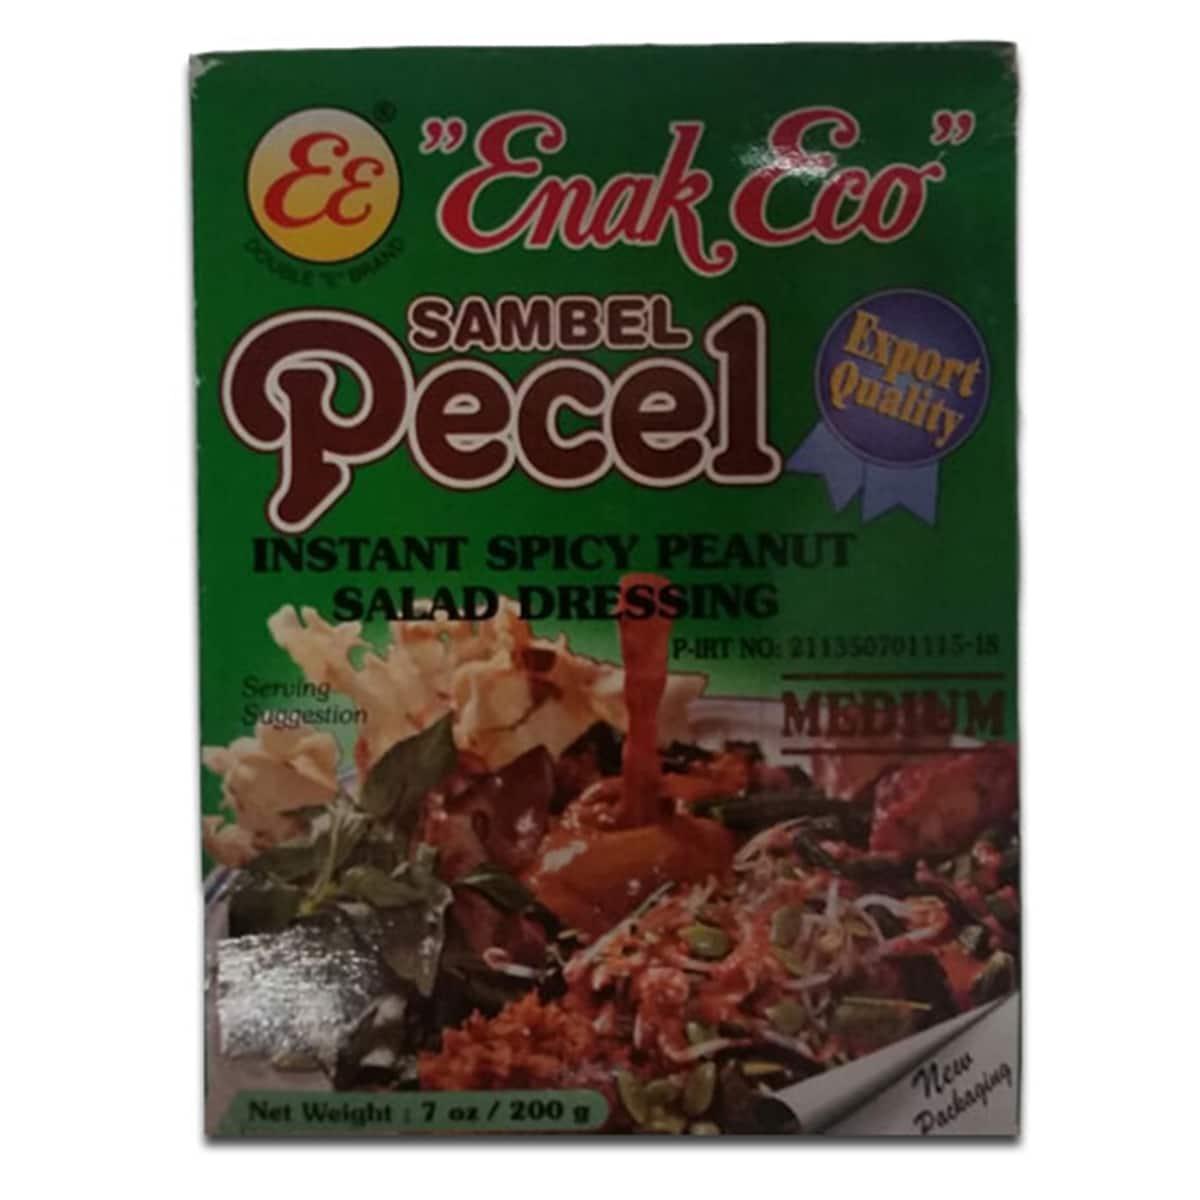 Buy Enak Eco Sambel Pecel (Instant Spicy Peanut Salad Dressing) Medium - 200 gm